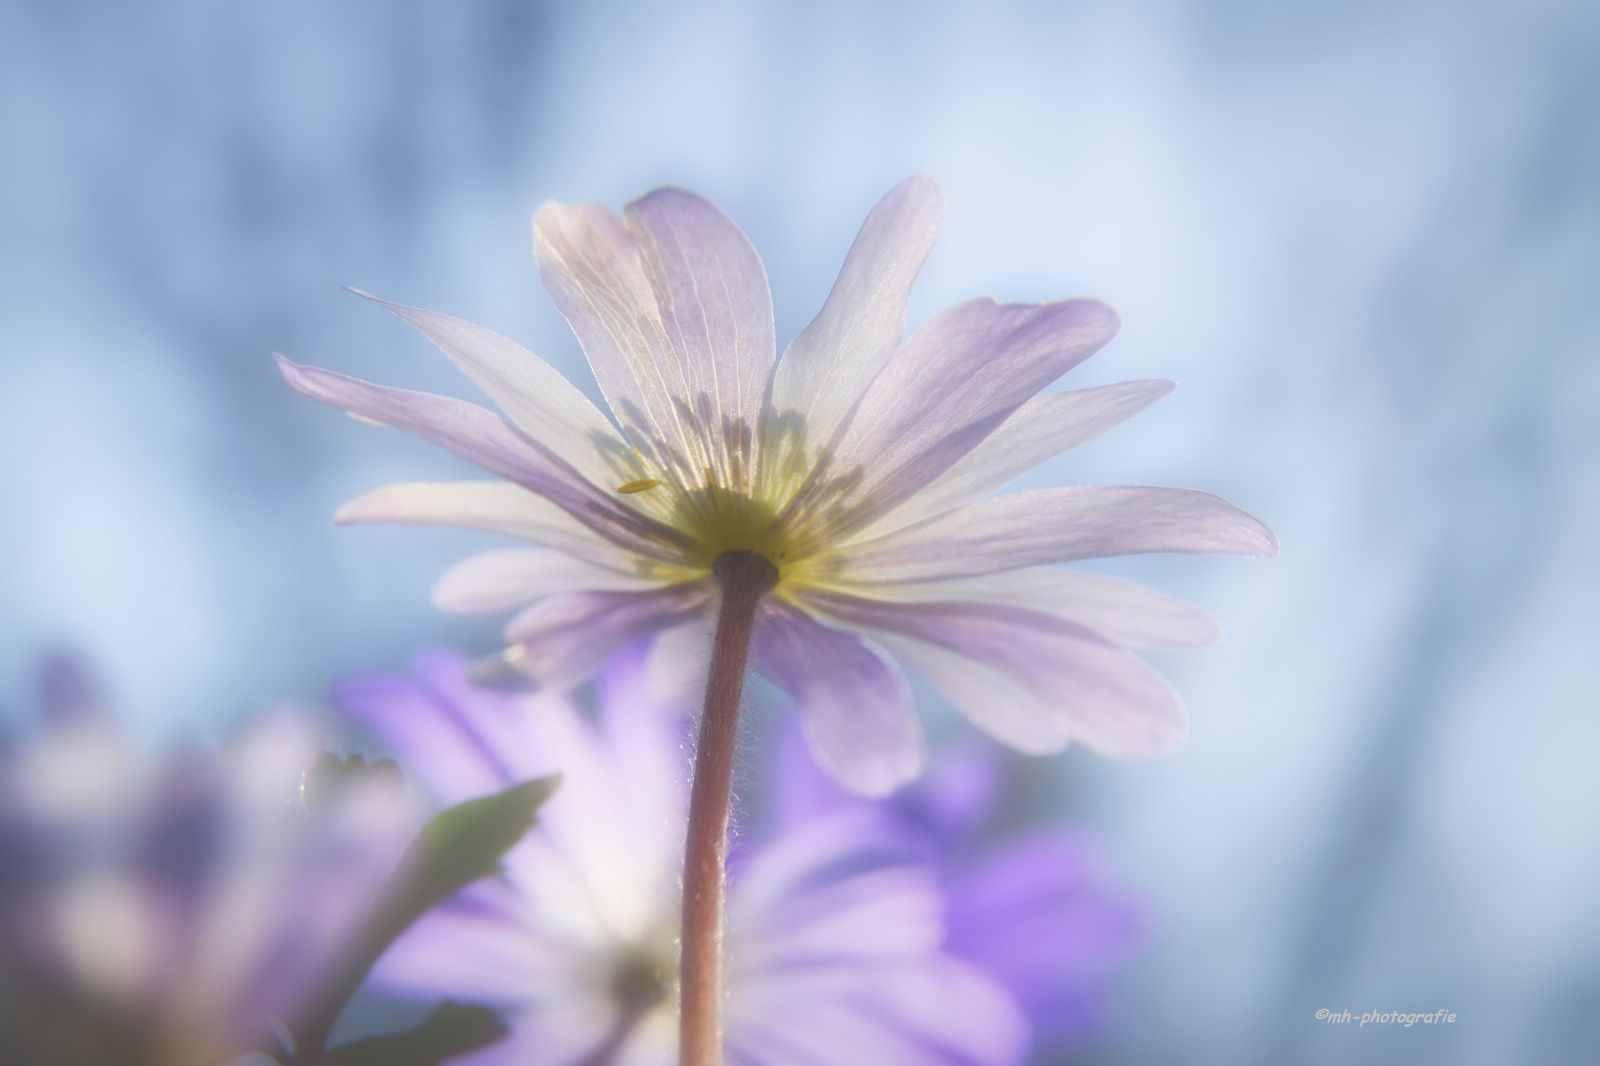 Blumen-DSC_4913-mh-photografie